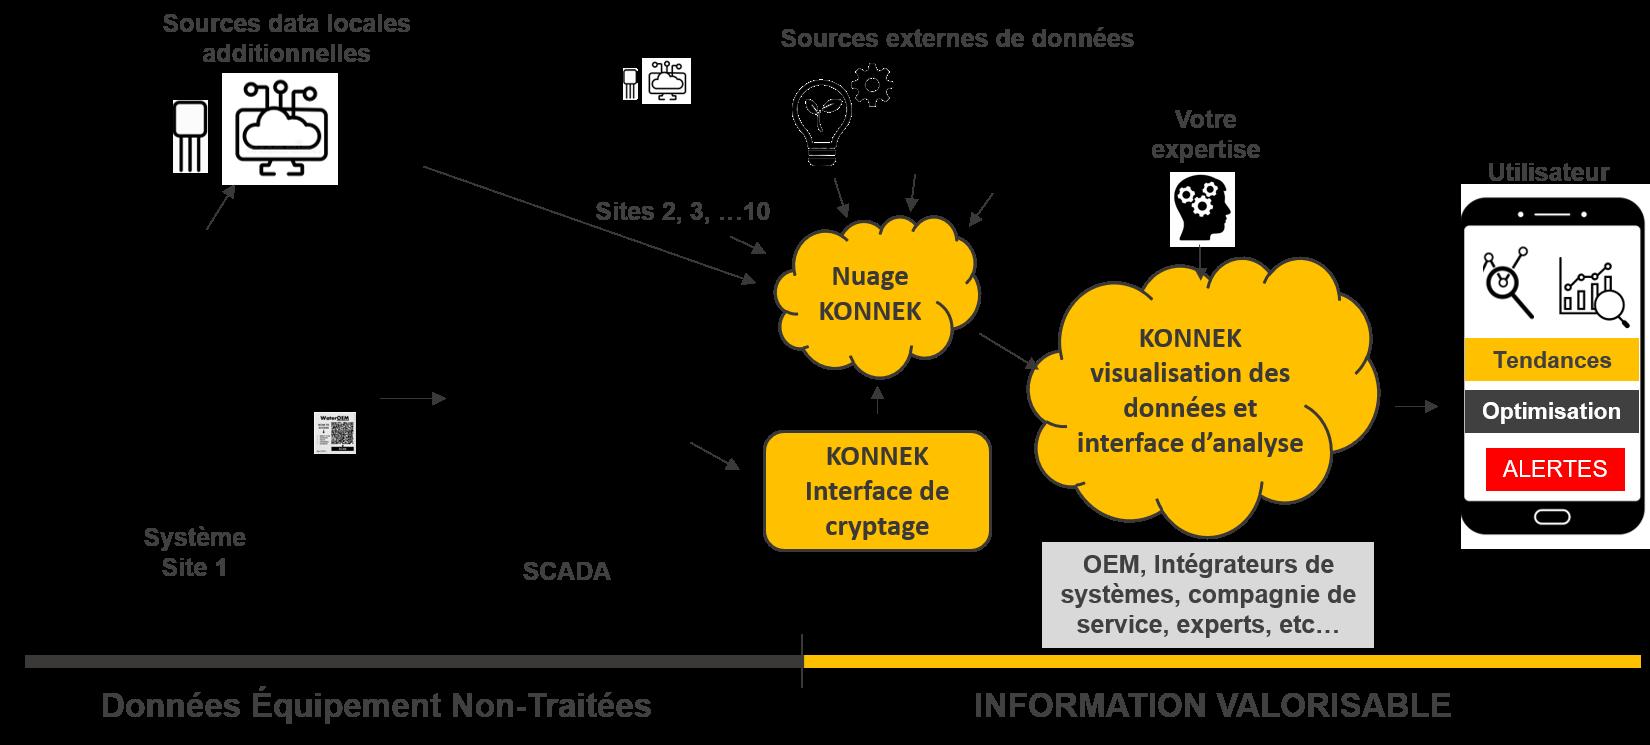 KONNEK IIOT IOT Industry 4.0